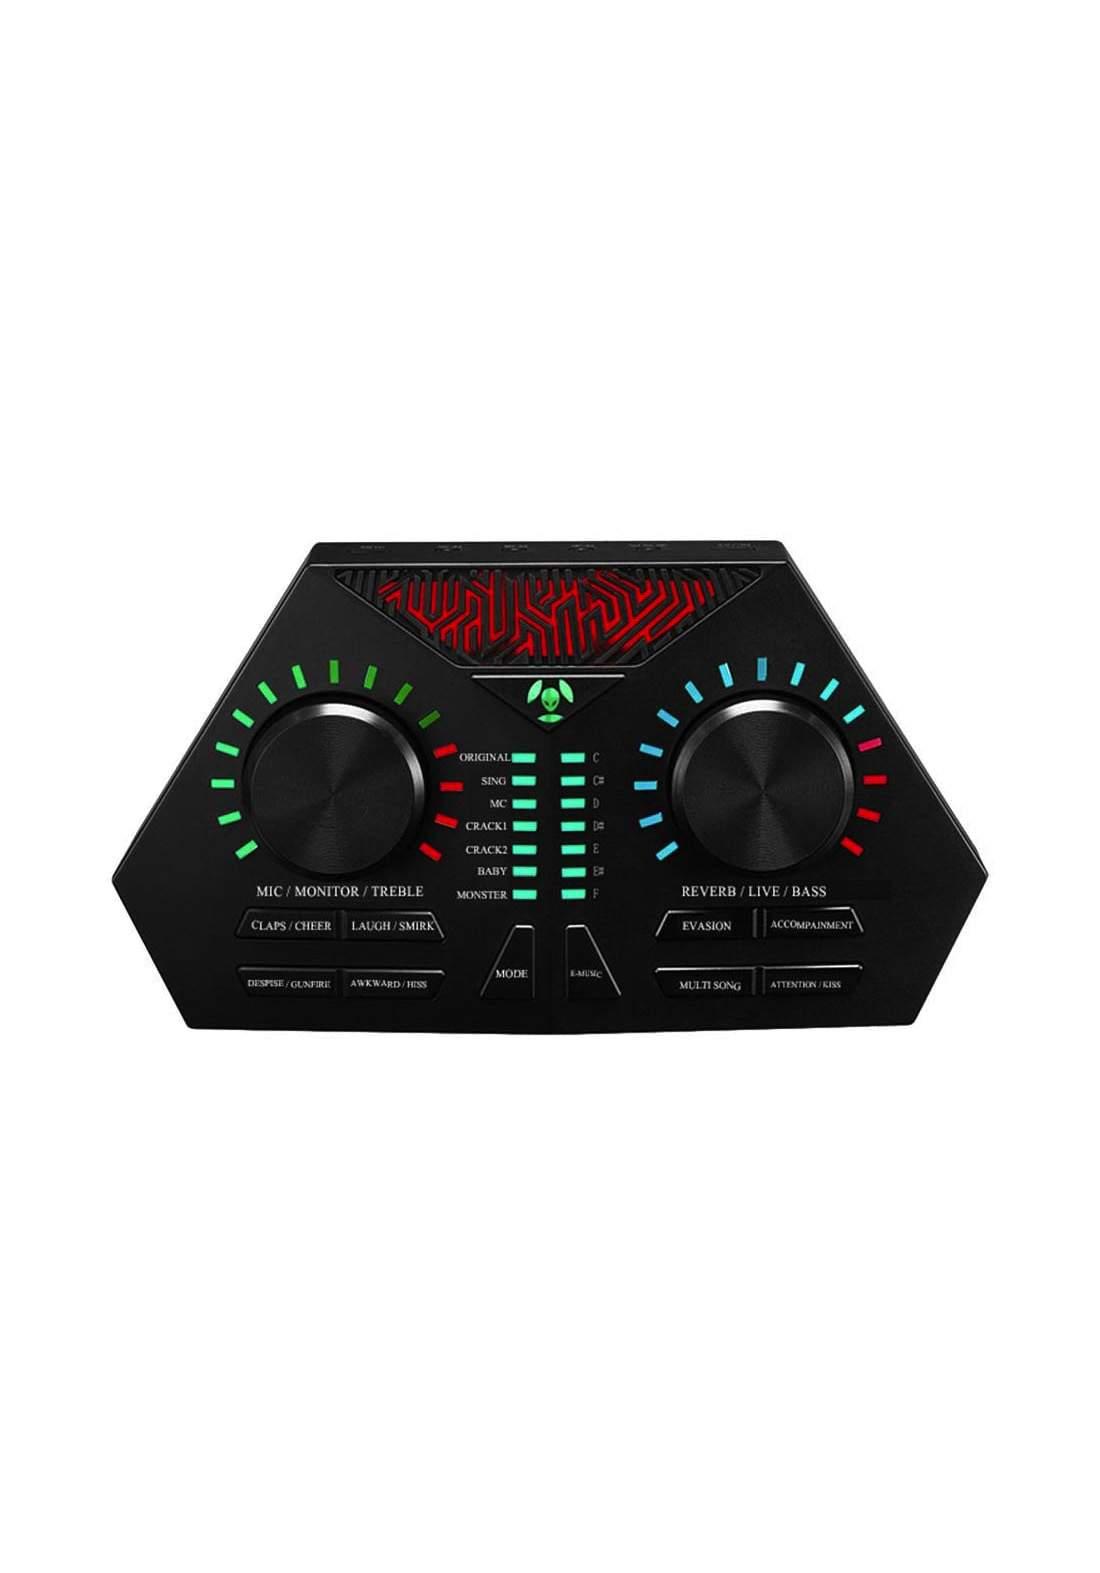 Widewing MAX730 External USB Sound Card Headset Singing Microphone- Black